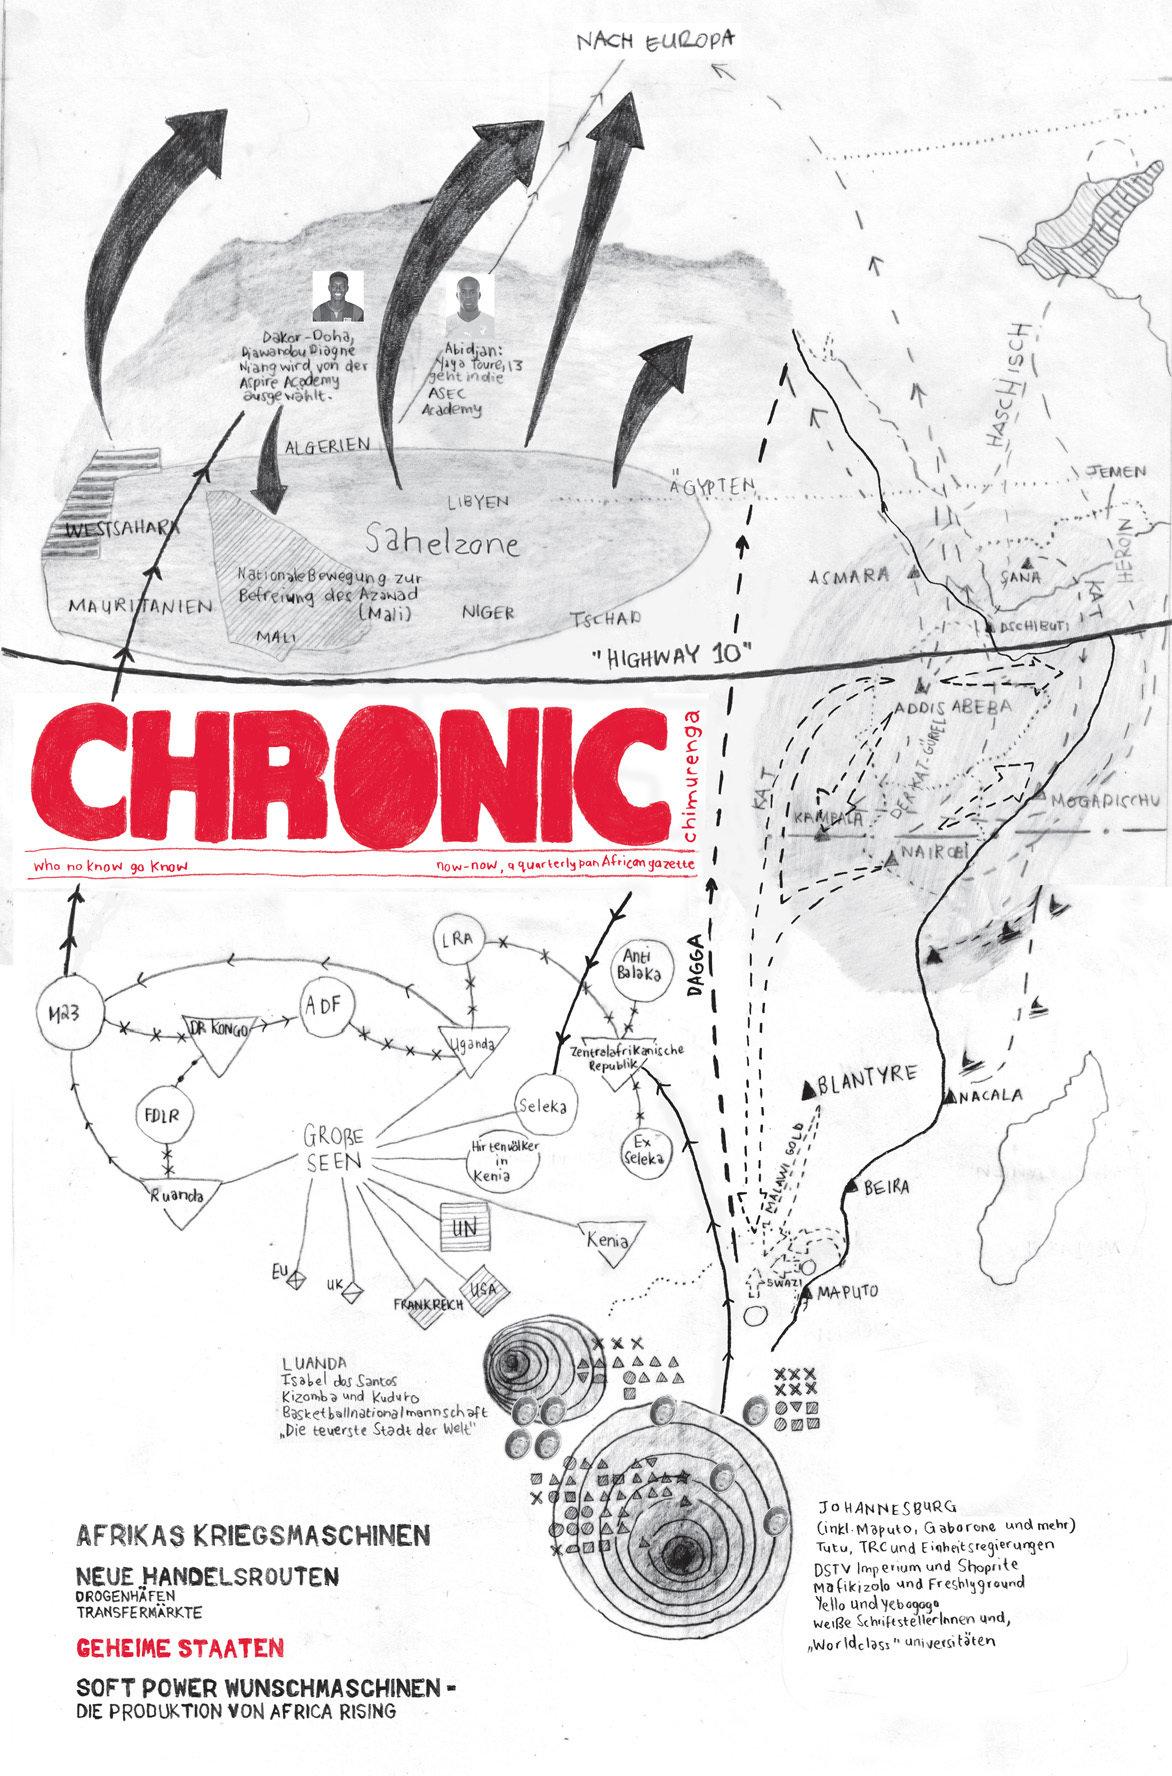 Chimurenga Chronic: New Cartographies (March 2015) Print